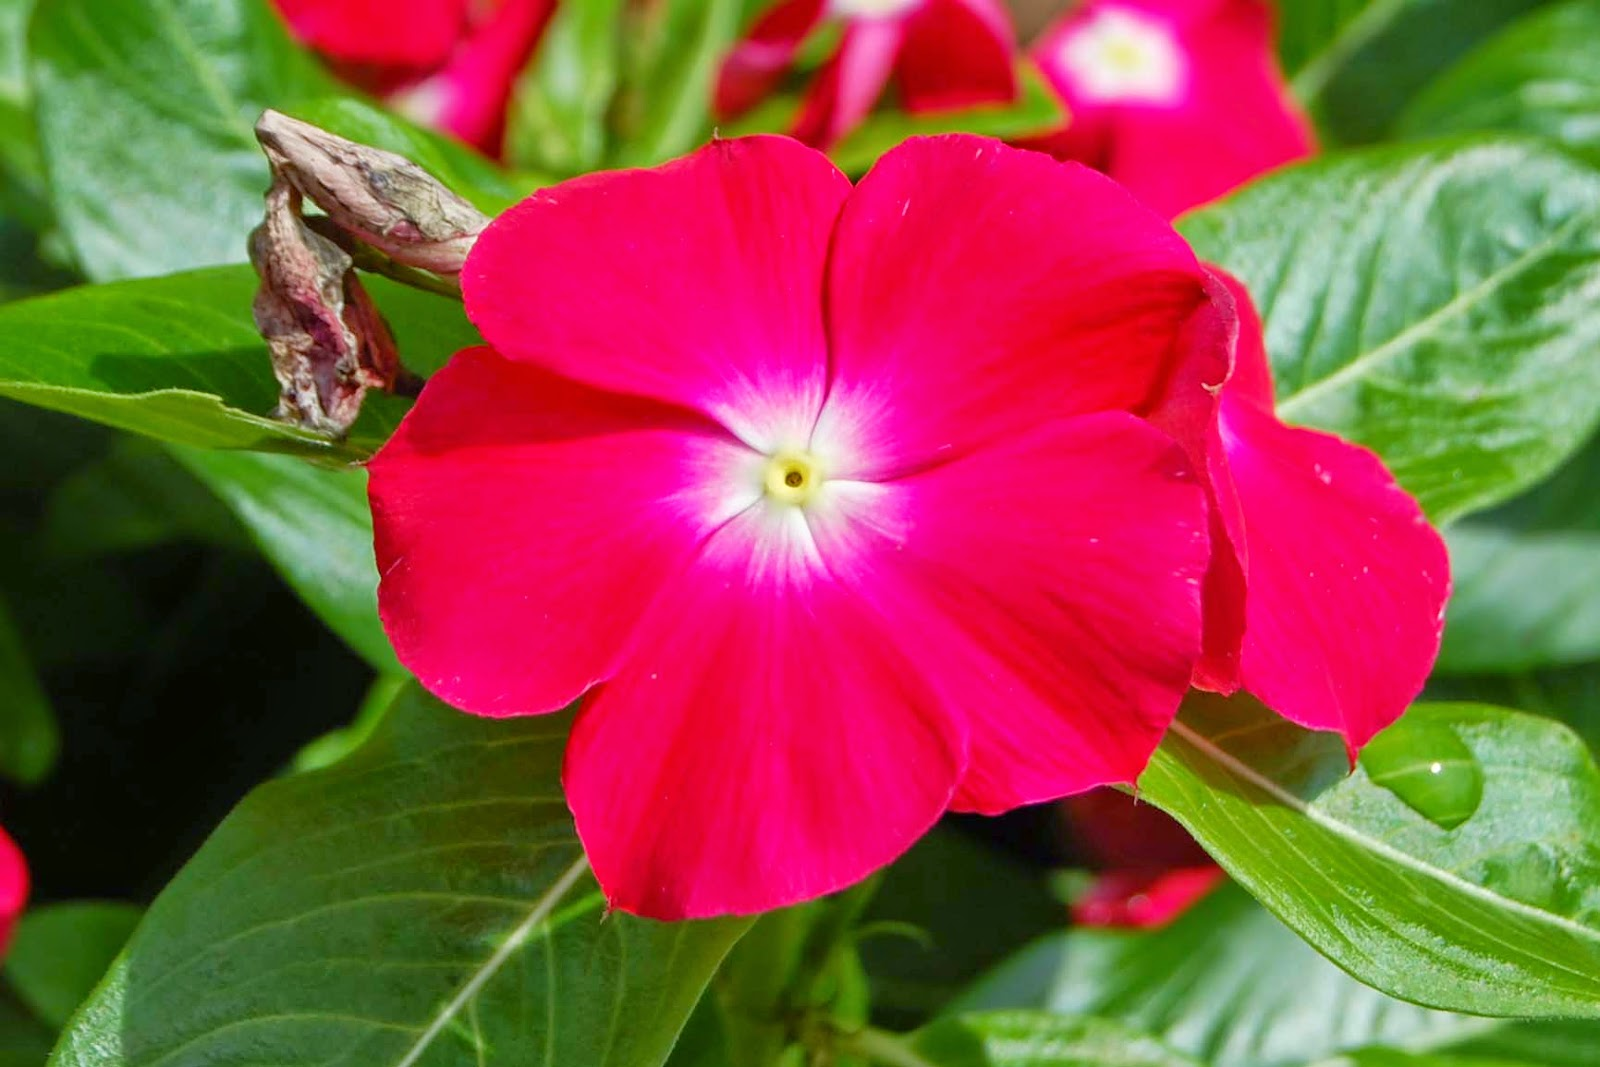 Annual vinca catharanthus roseus rotary botanical gardens jaio scarlet w eye izmirmasajfo Gallery